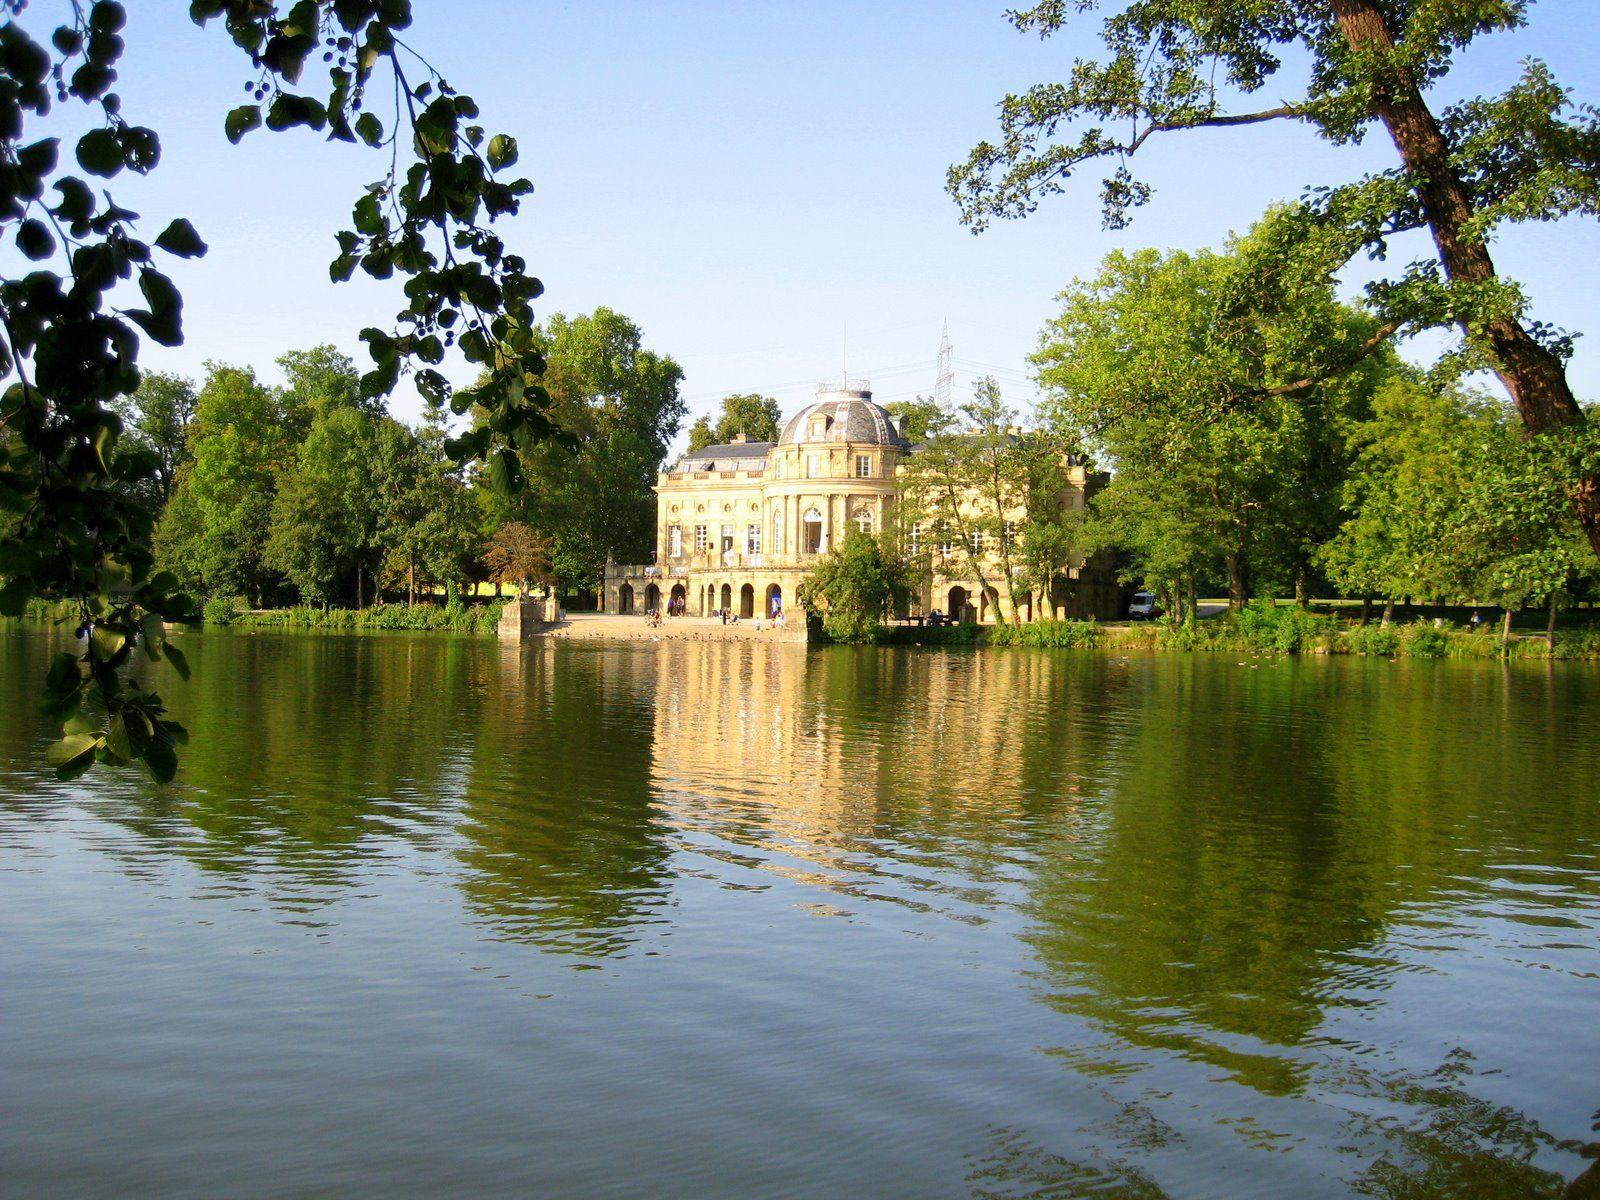 Schloss Monrepos Ludwigsburg Germany Wonderful Places Royal Residence Places